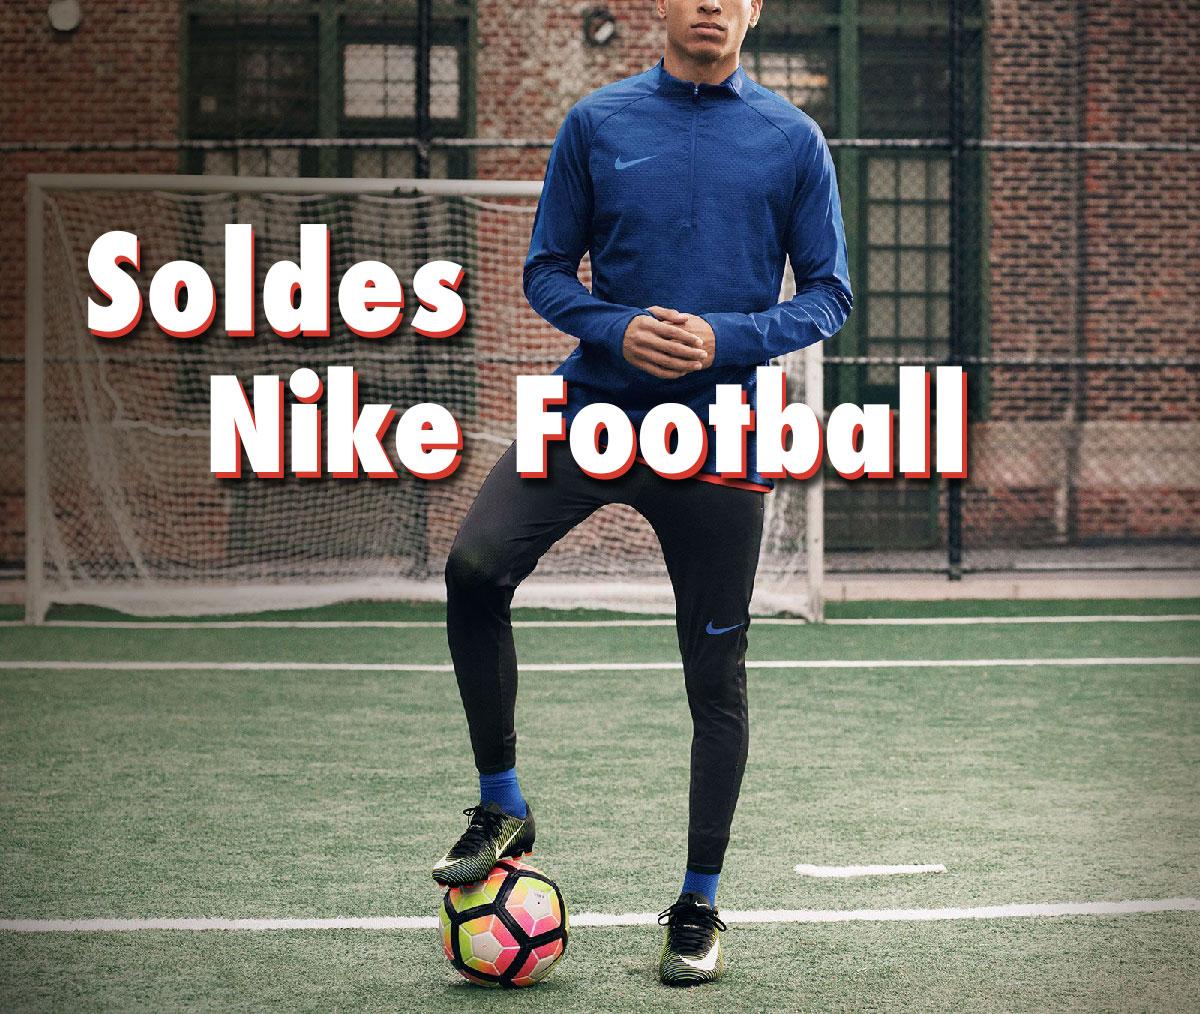 nike football soldes